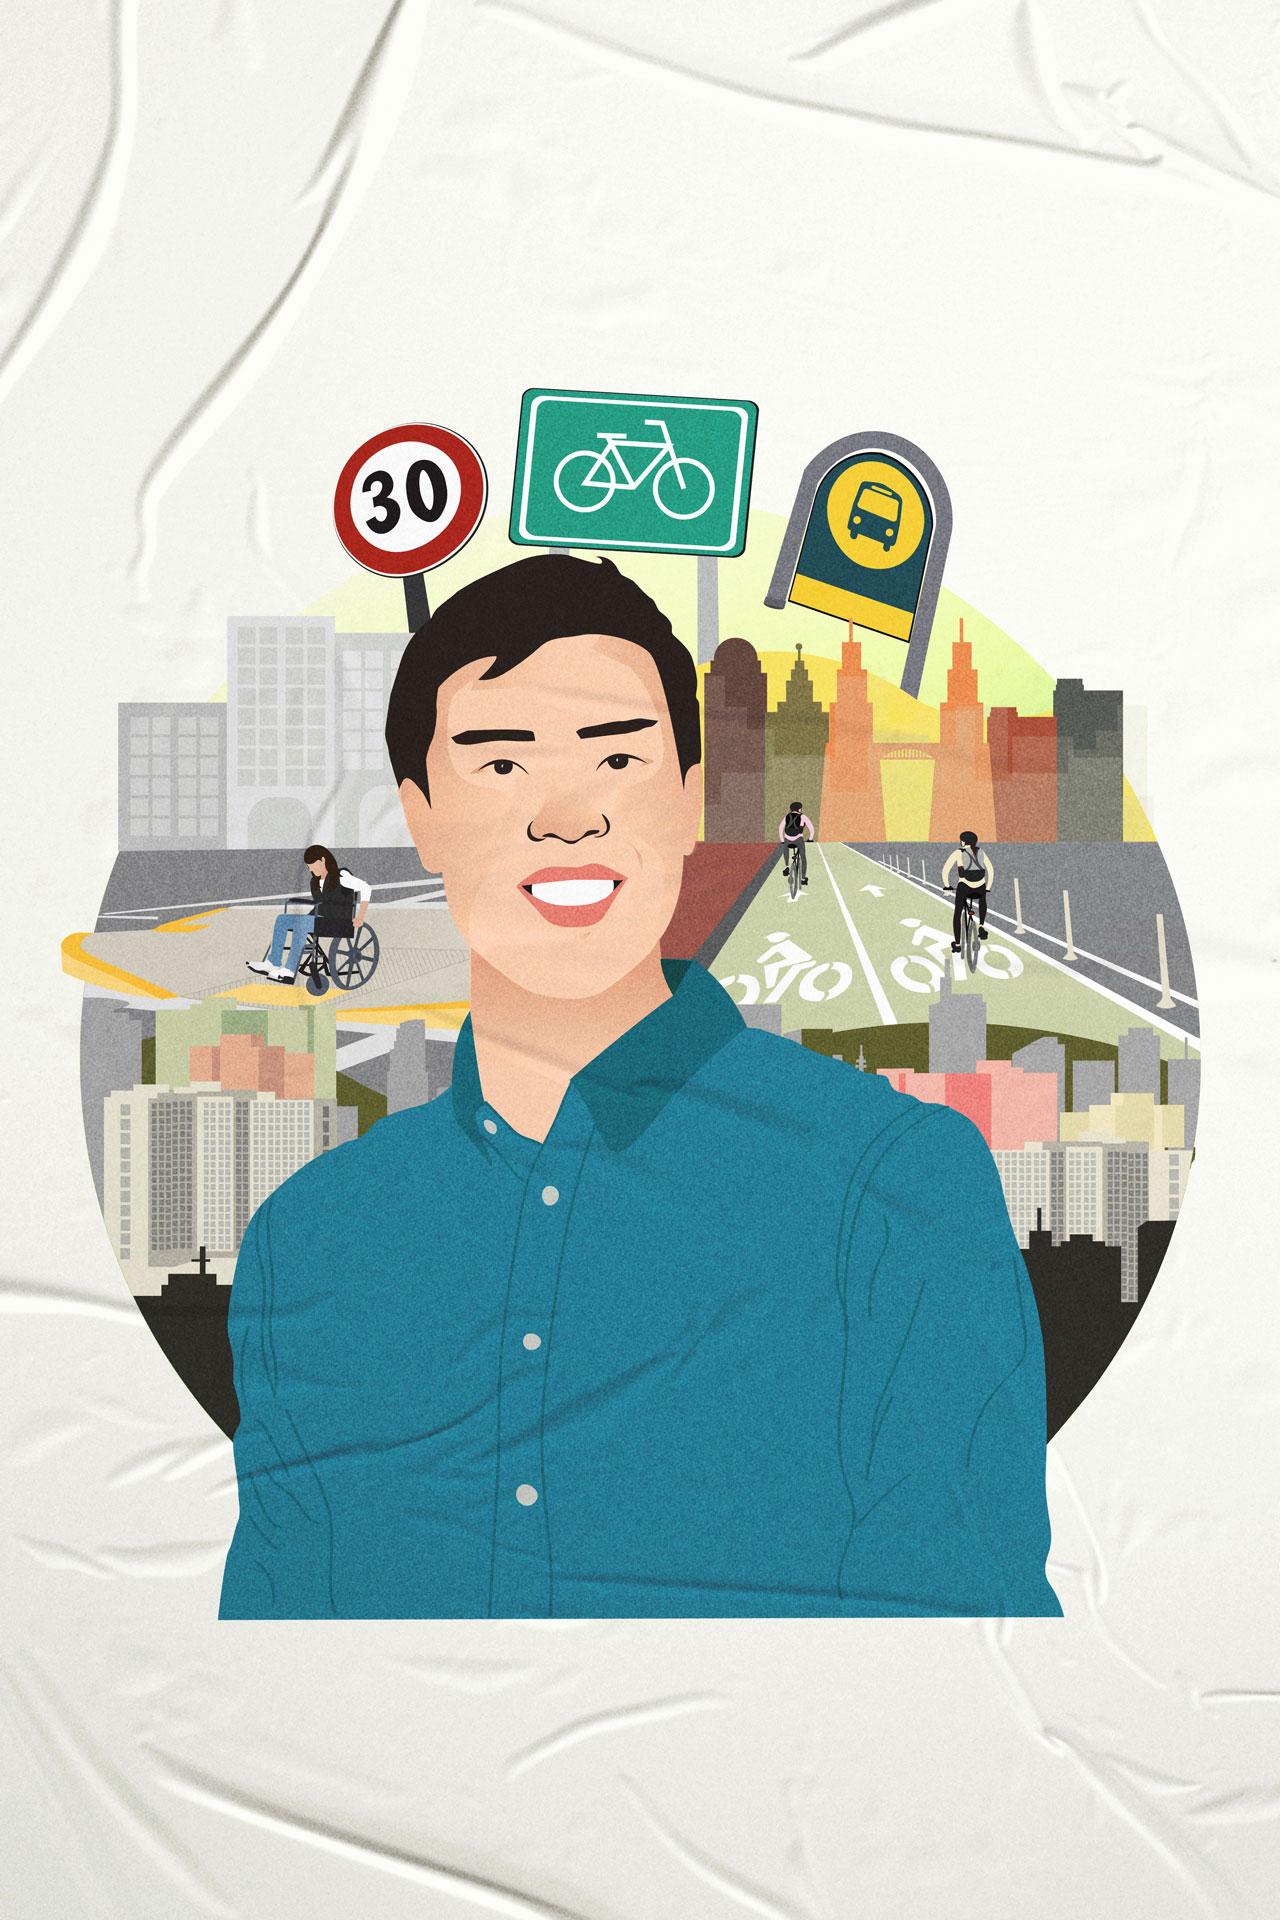 Anton Siy Chief Transport Planner, Pasig City, illustration by Isabela Ferrer